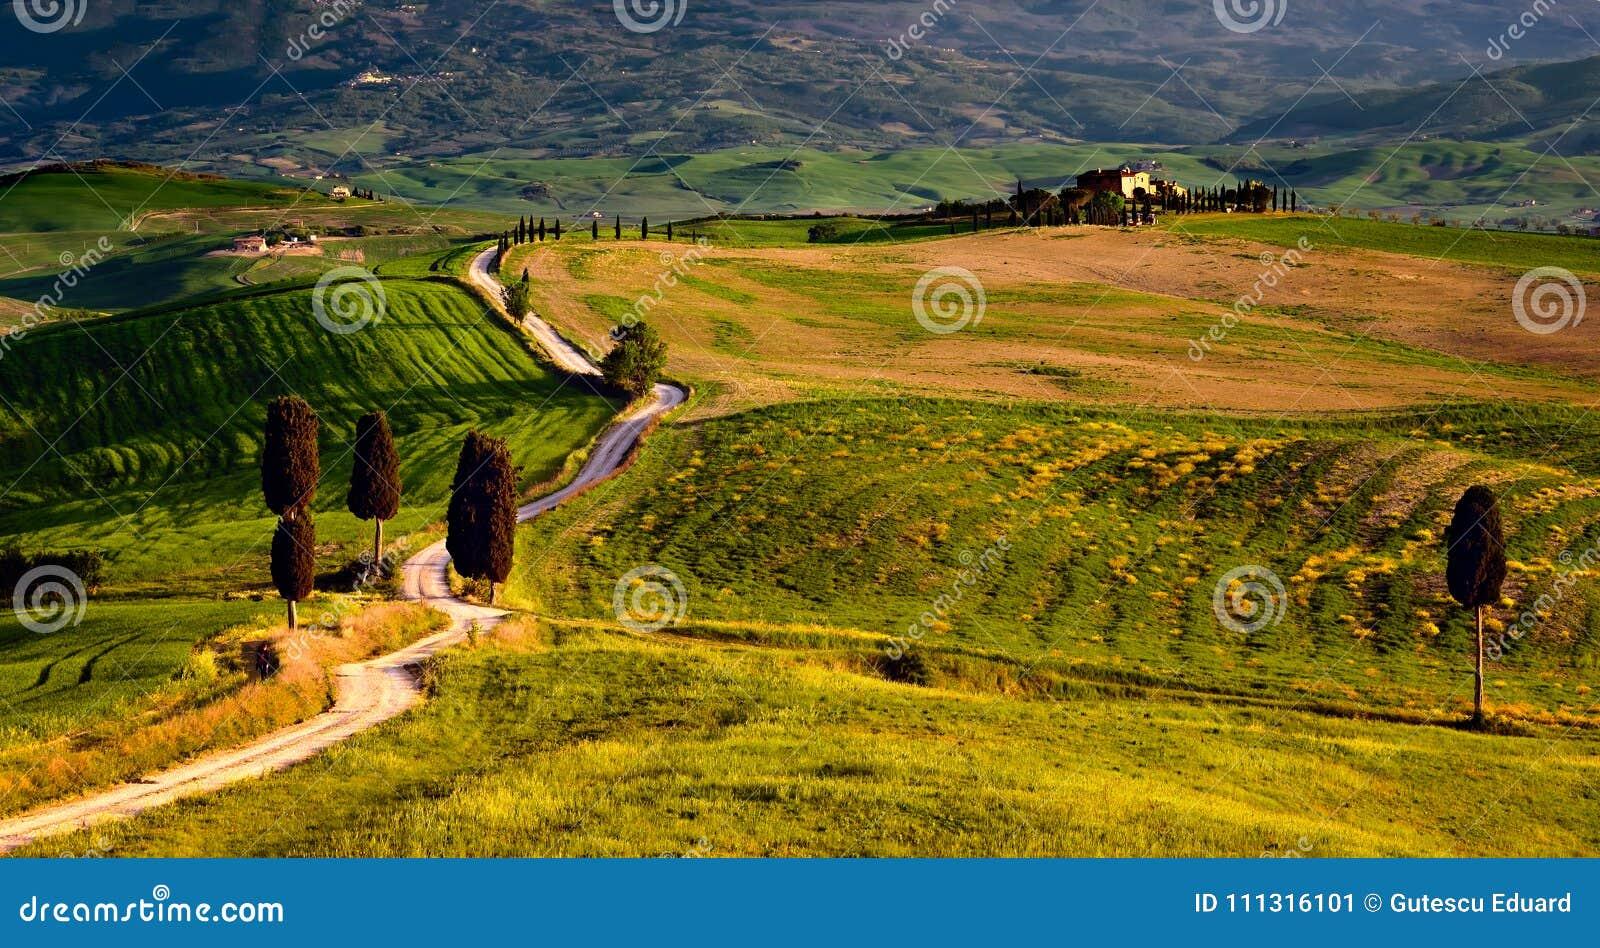 Tuscany scena od gladiatora filmu z drogą i domem wiejskim